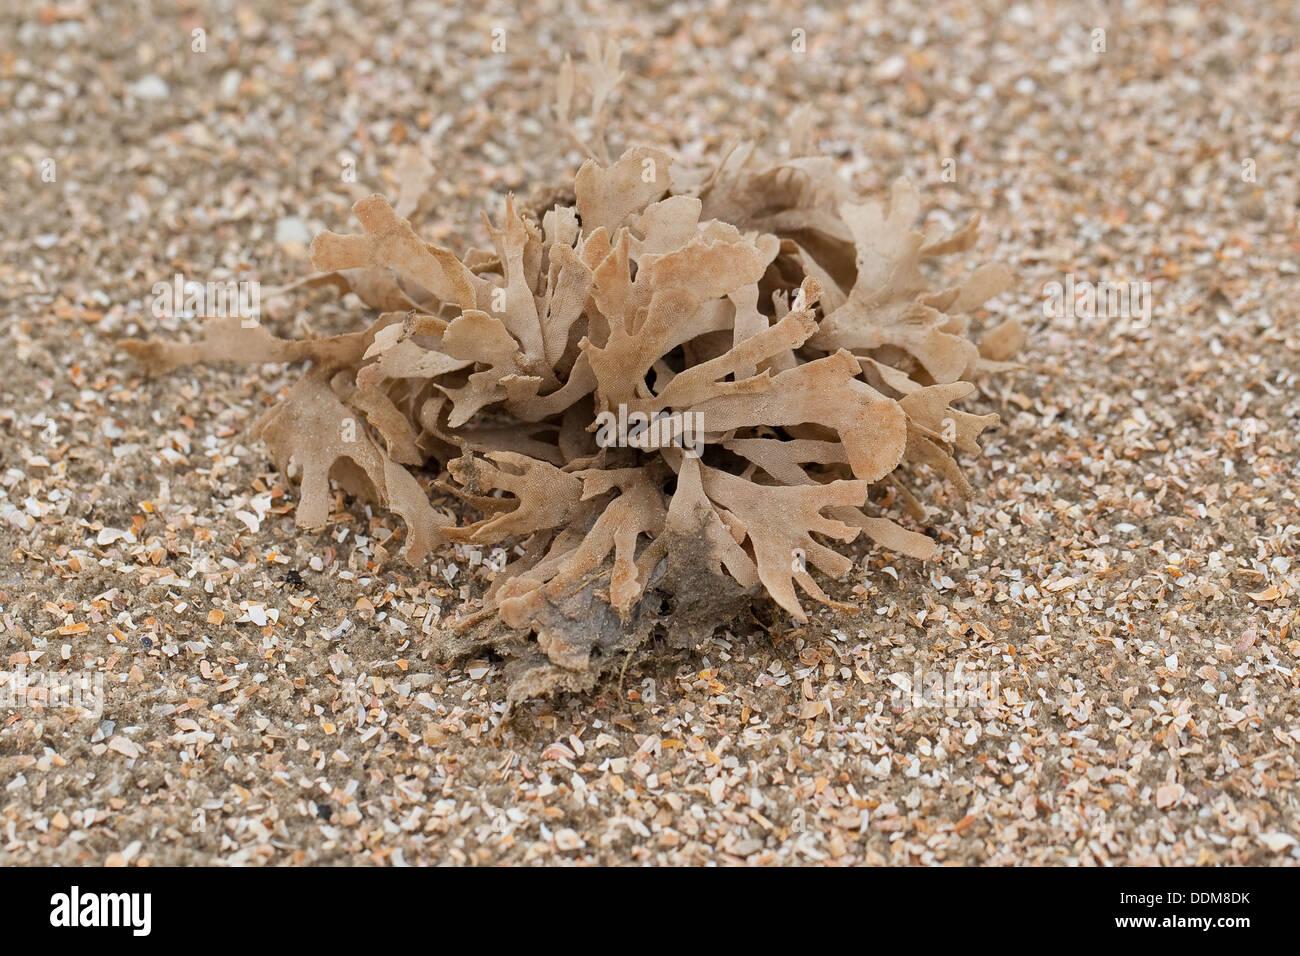 Broad-leaved Hornwrack, Blätter-Moostierchen, Blättermoostierchen, Moostierchen, Flustra foliacea Stock Photo